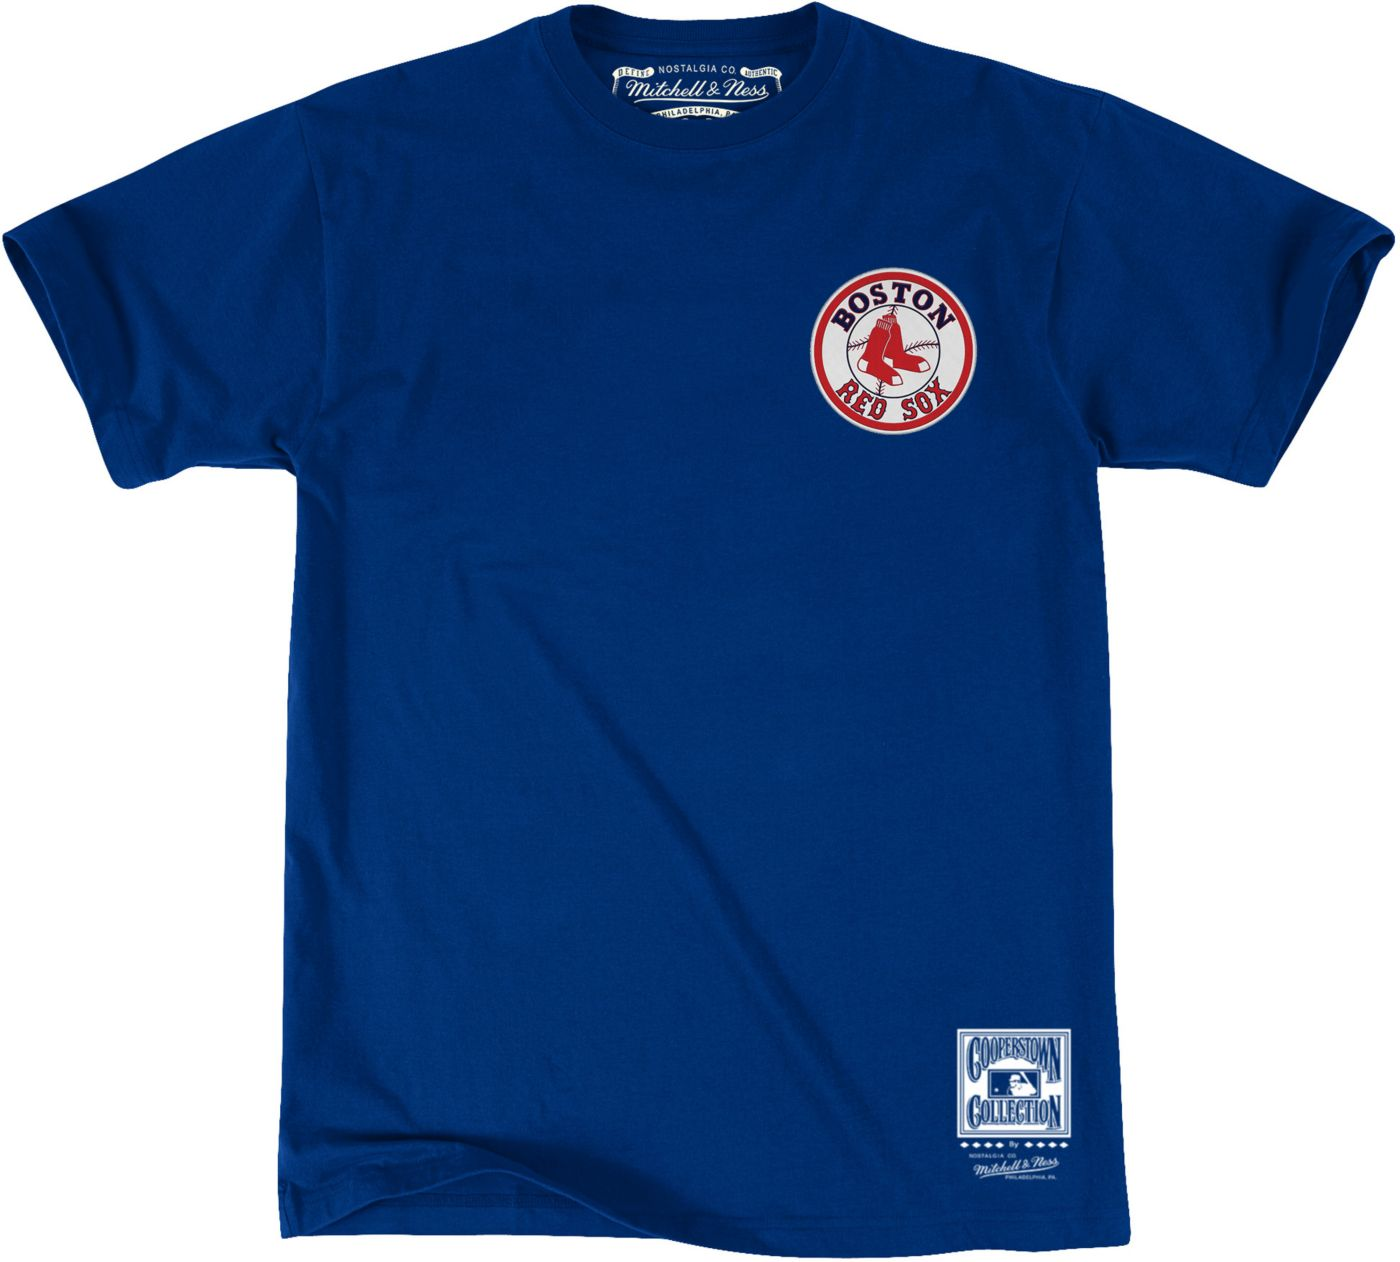 Mitchell & Ness Men's Boston Red Sox Retro T-Shirt